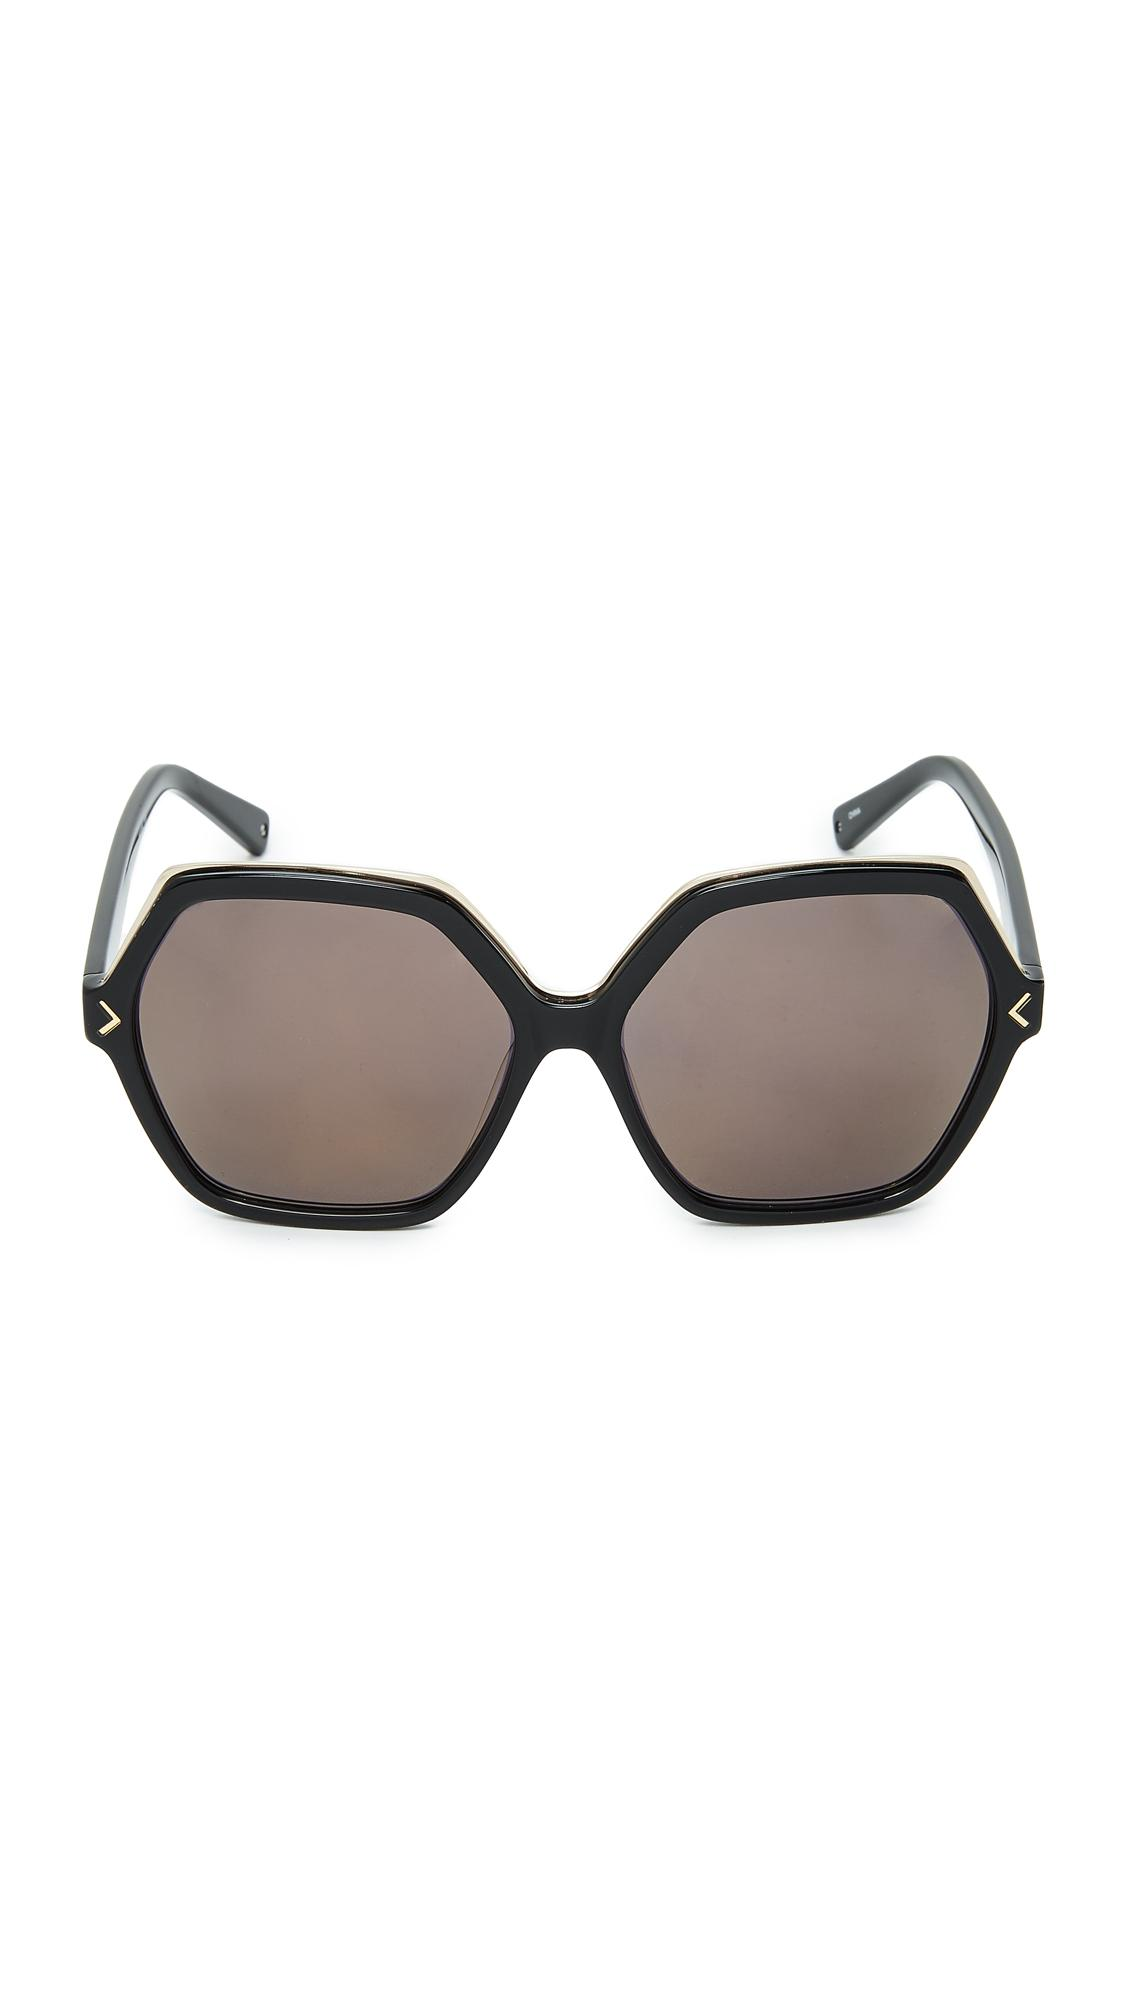 Kendall + Kylie Ludlow Sunglasses in Shiny Black/Smoke (Black)